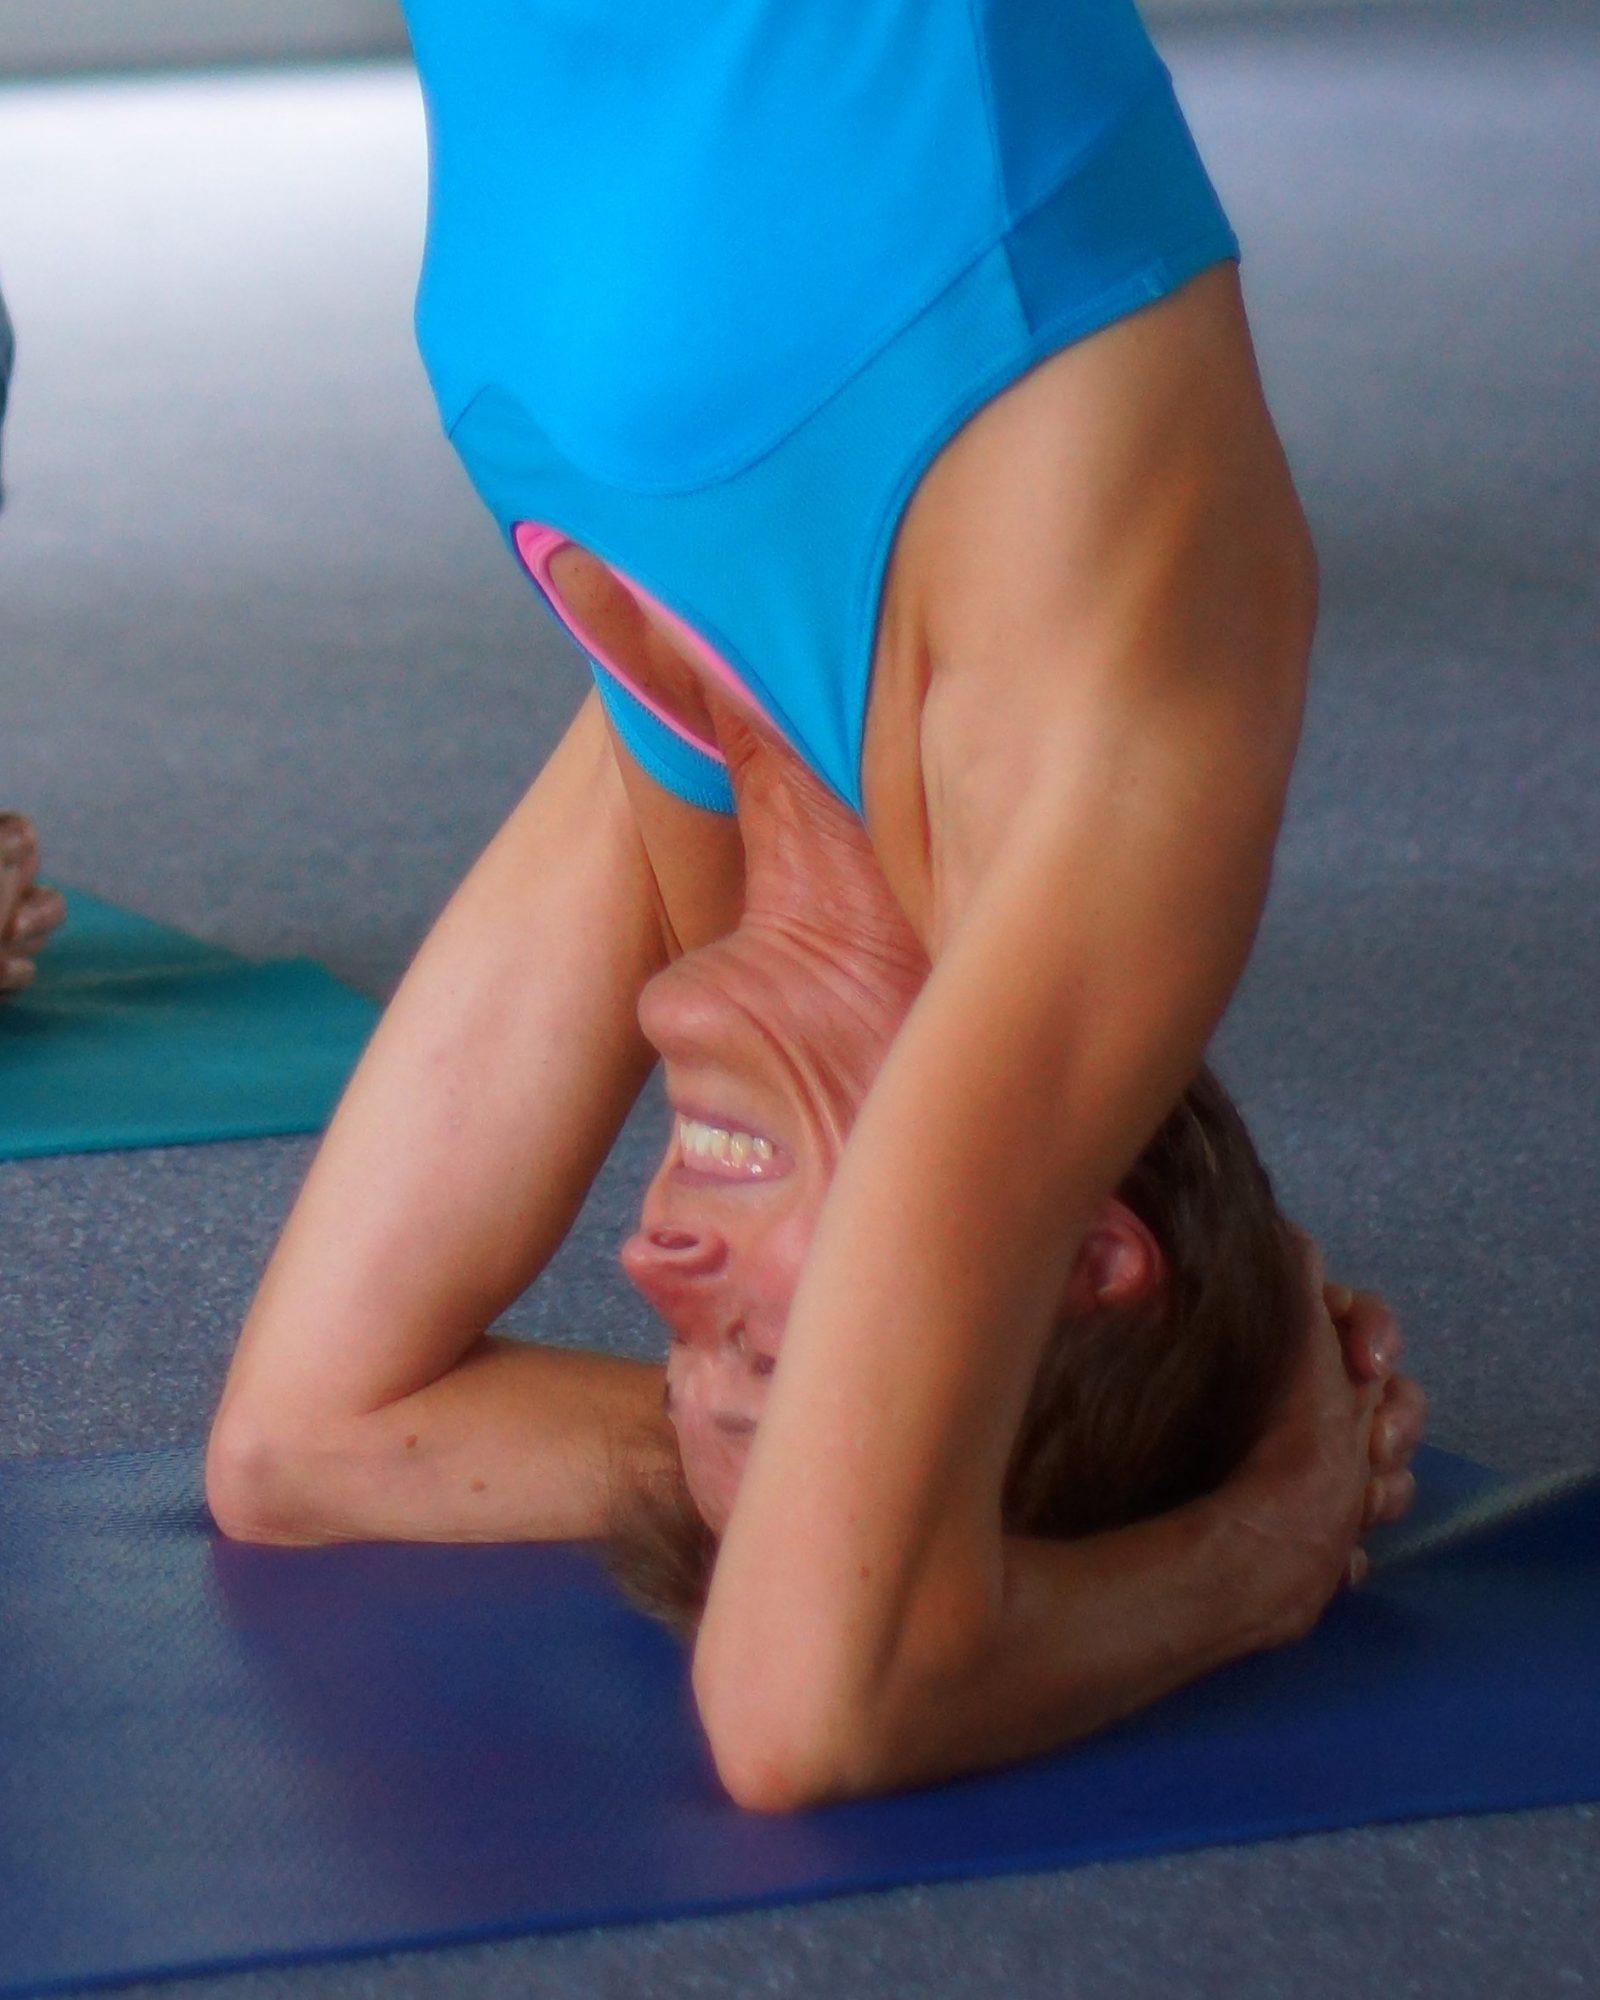 General Yoga - Rostered Instructors